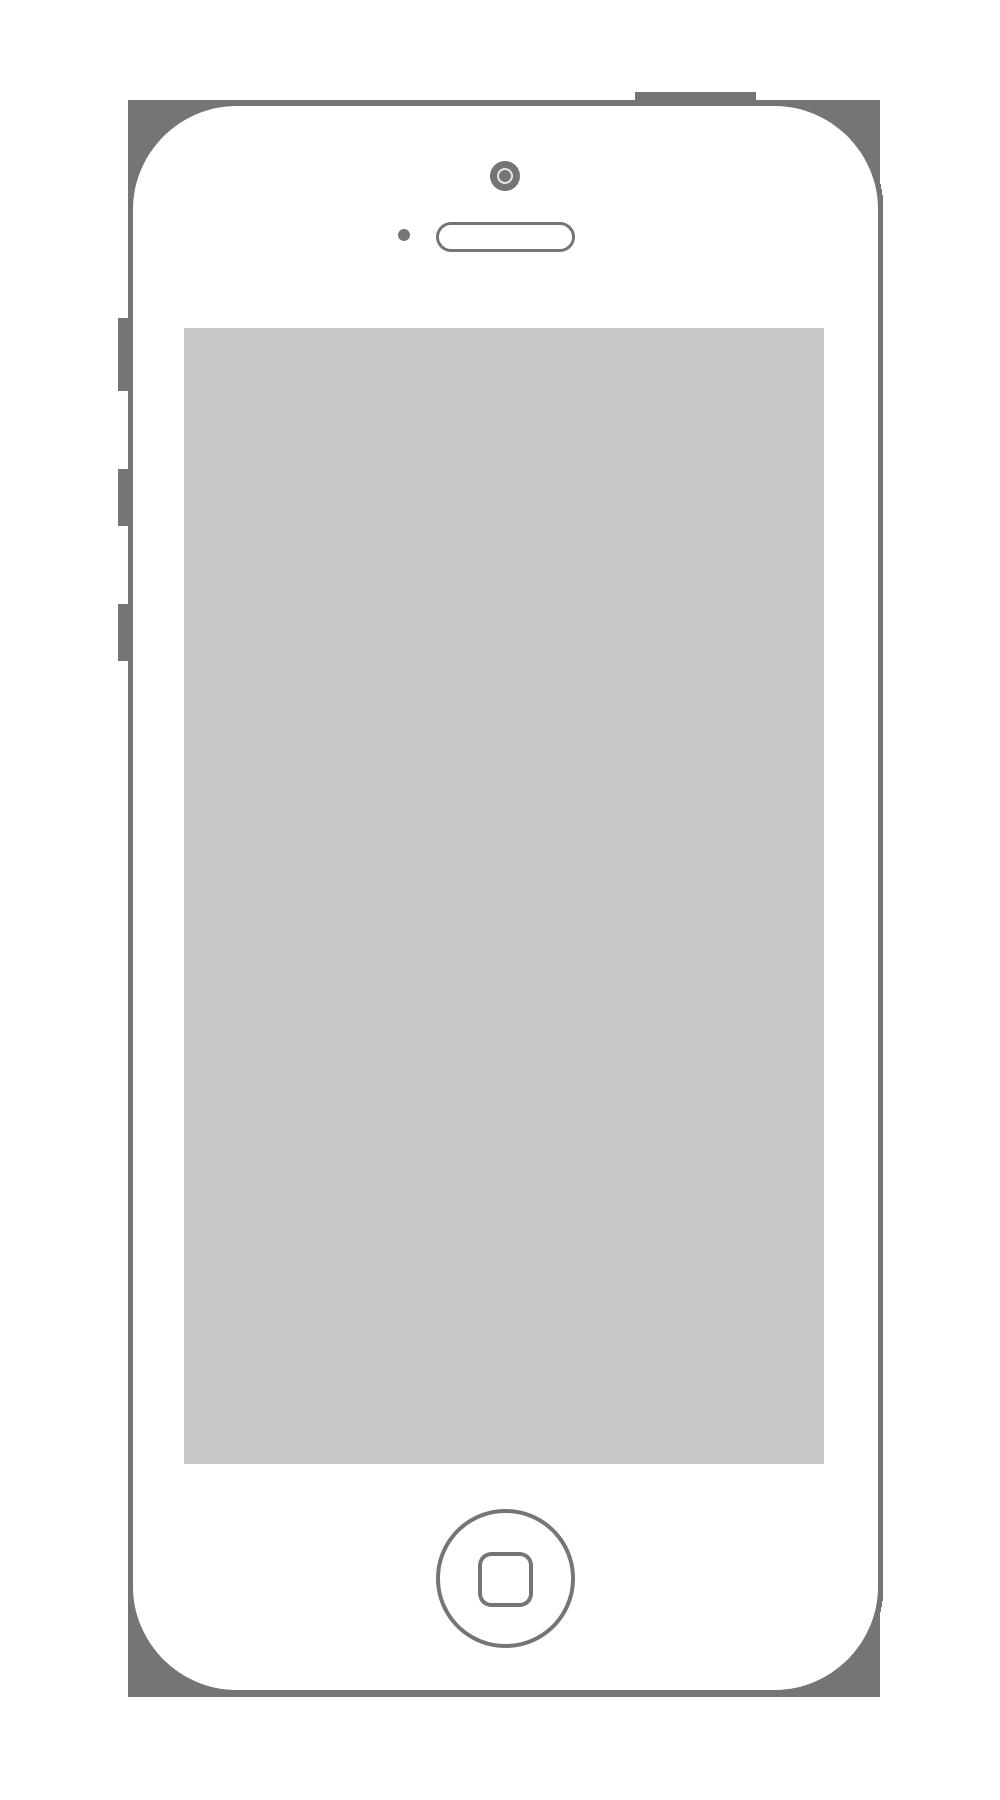 iPhone5 Horizontal 1000x1800